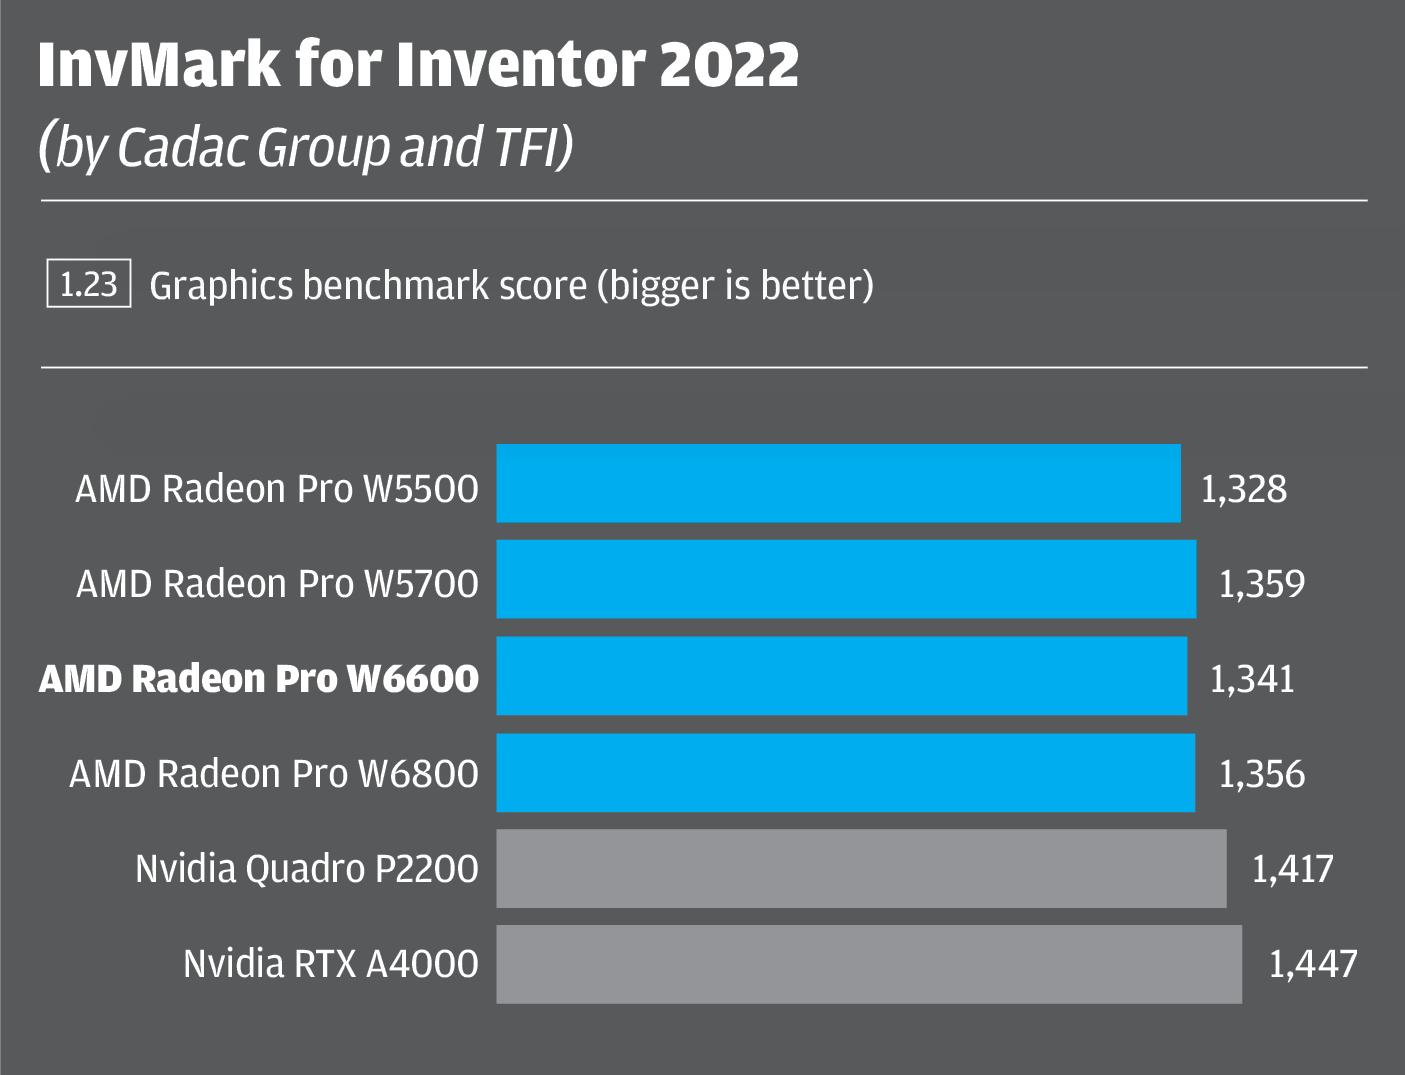 Radeon Pro W6600 Inventor CAD